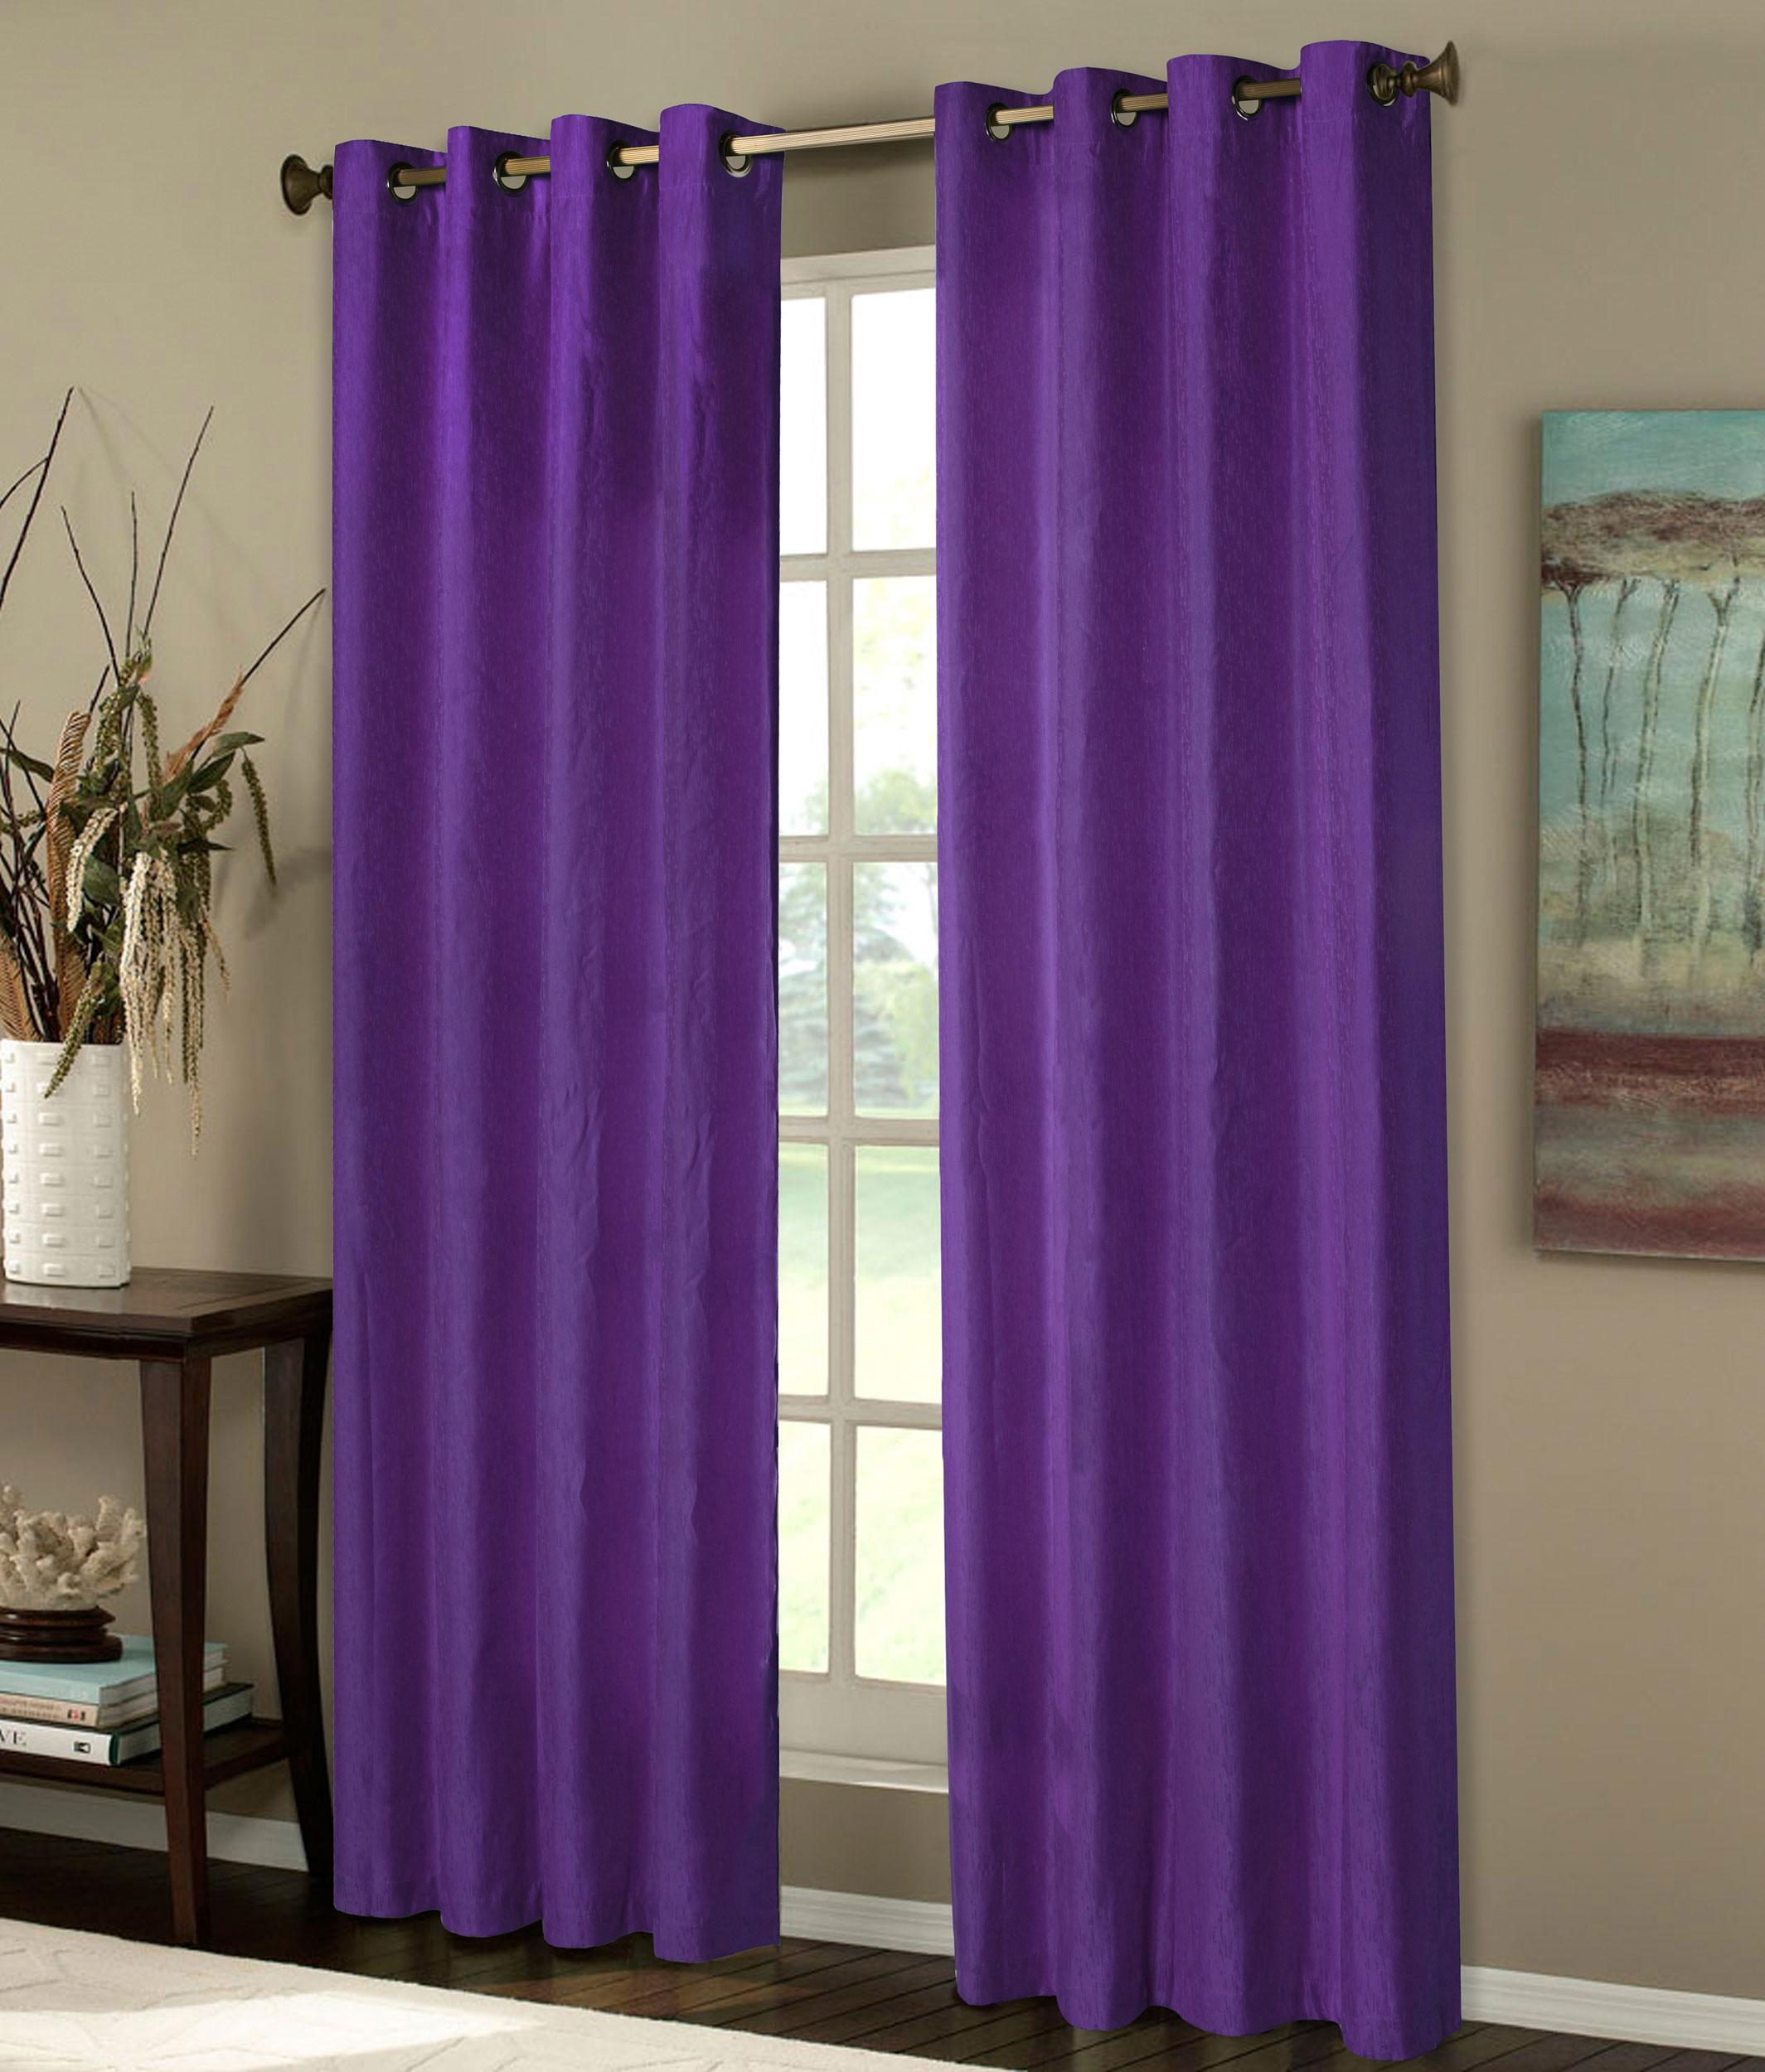 thermo gardine sen vorhang mit polar fleece r cken matt blickdicht 20500 ebay. Black Bedroom Furniture Sets. Home Design Ideas